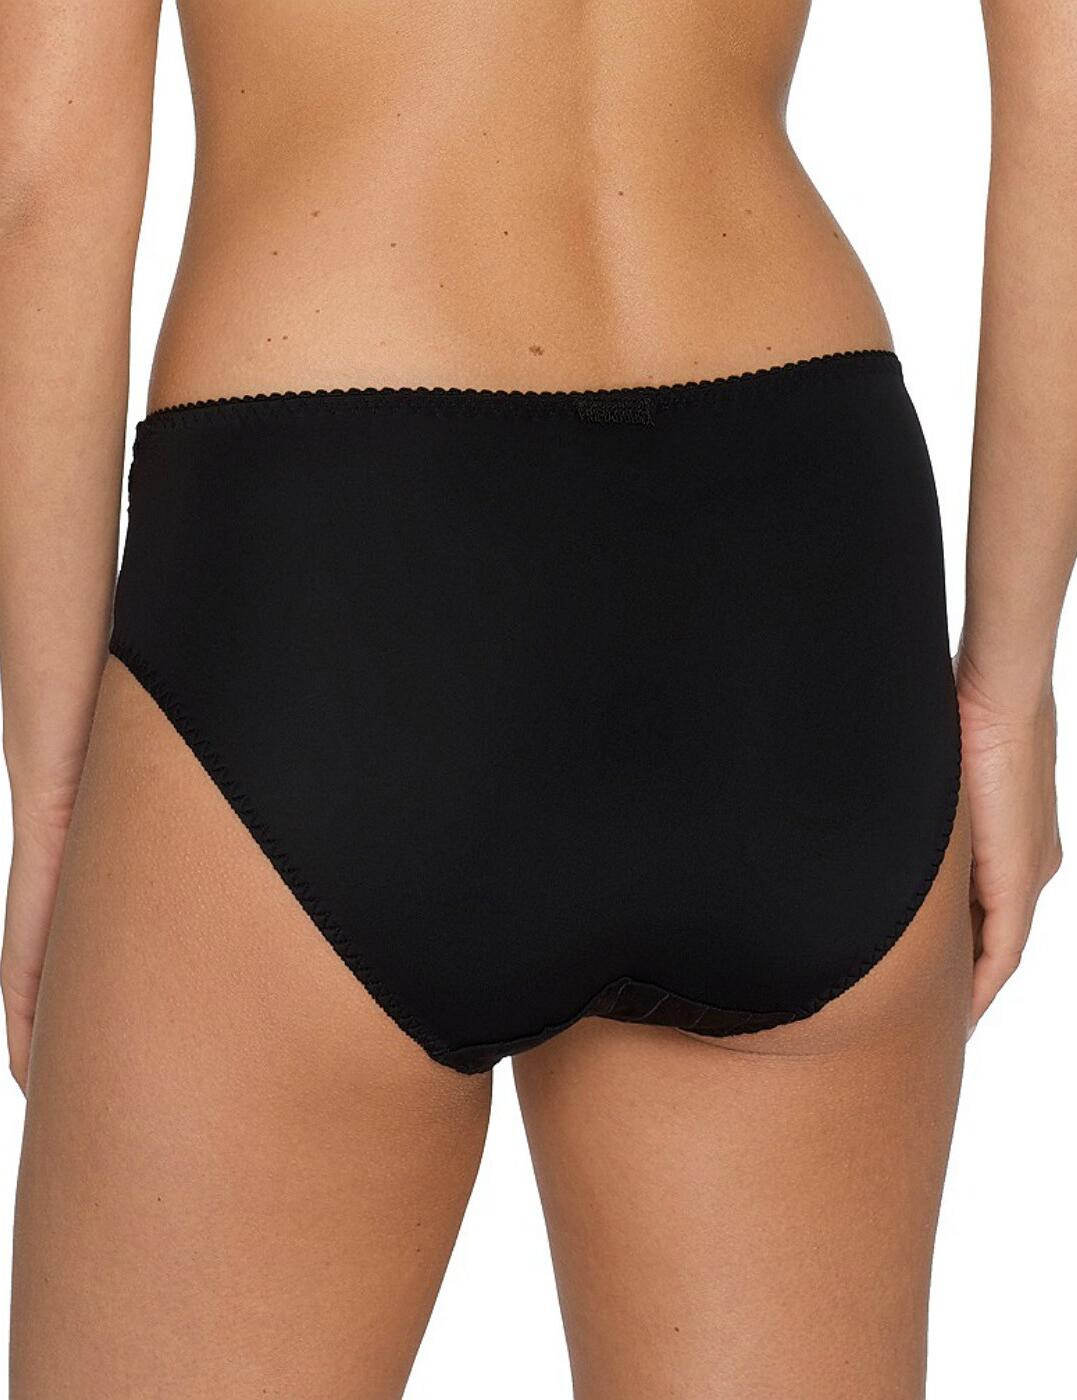 Prima-Donna-Deauville-Volle-Unterhose-Slip-Slips-Pant-0561811-Luxus-Dessous Indexbild 12